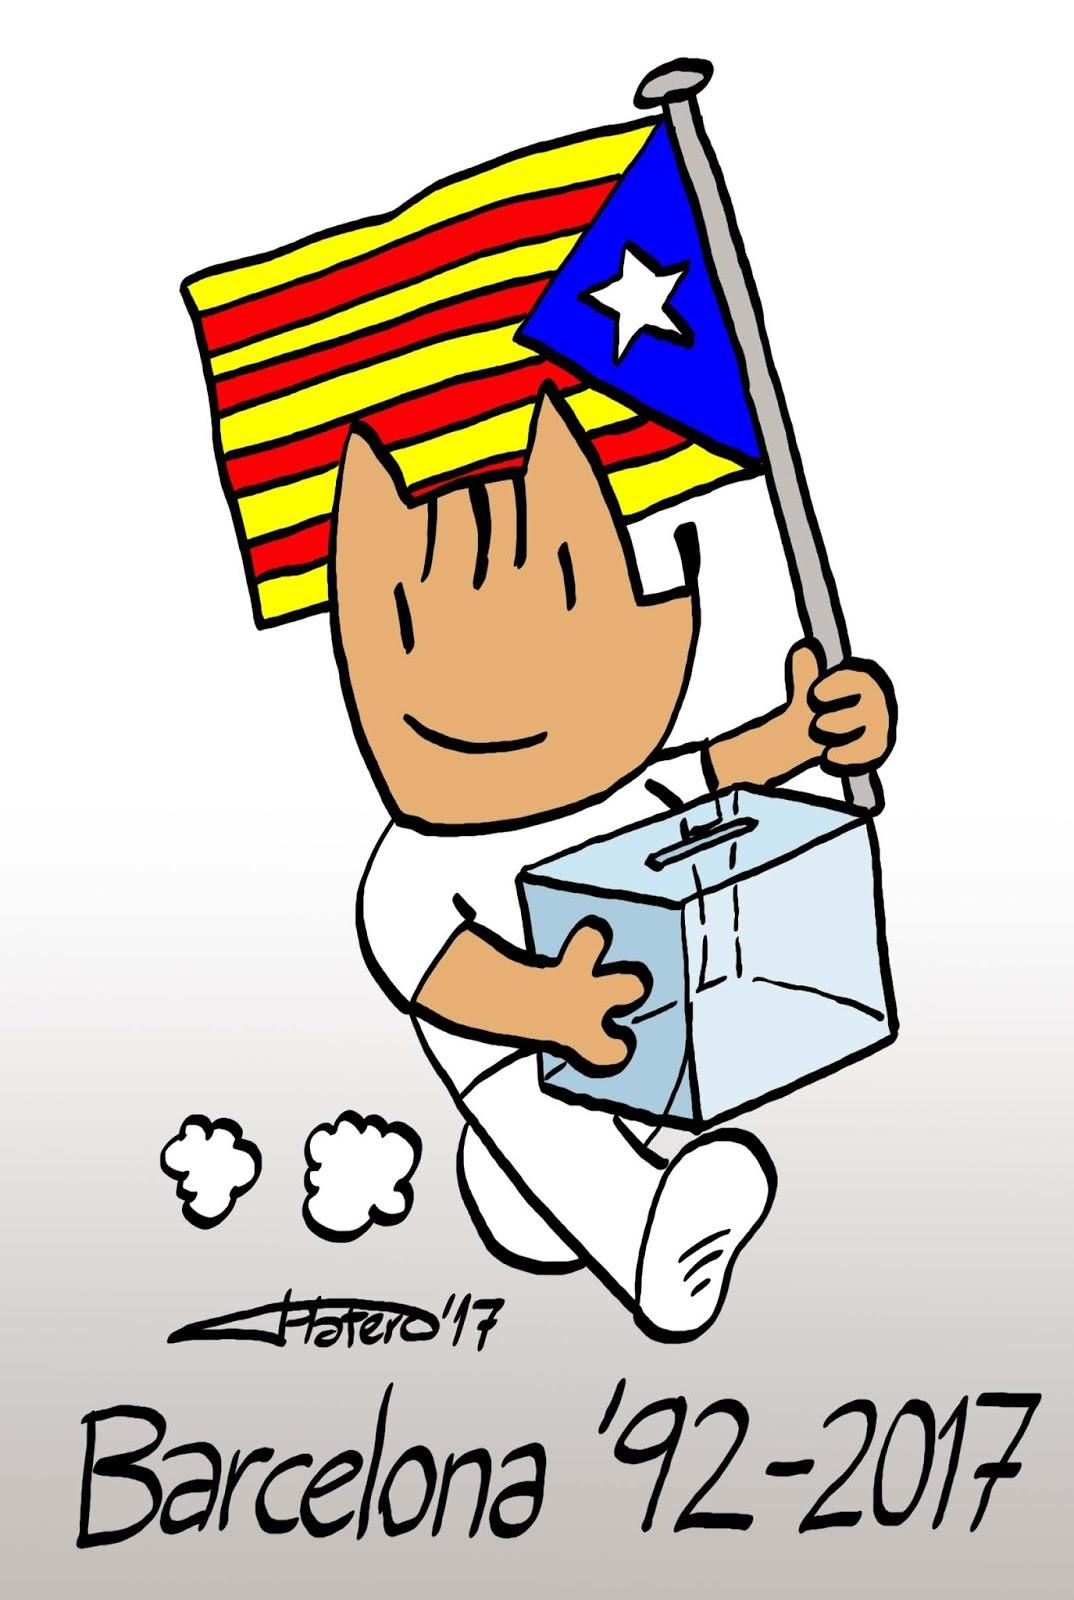 Platero Caricaturas Comics E Ilustraciones 25 Aniversario Juegos